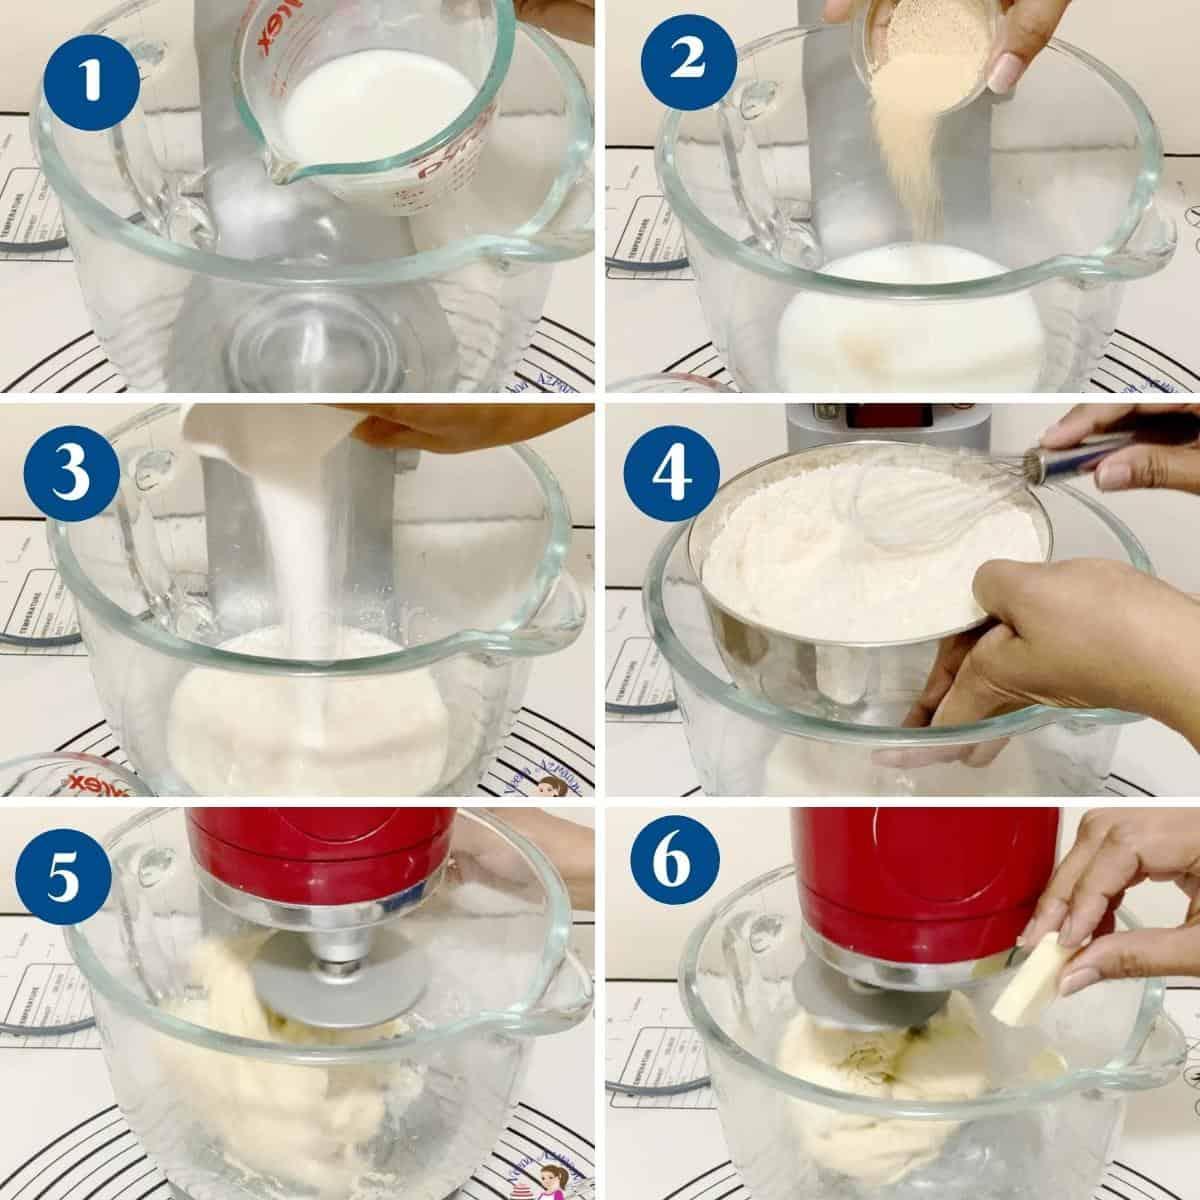 Progress pictures collage making the croissants dough.